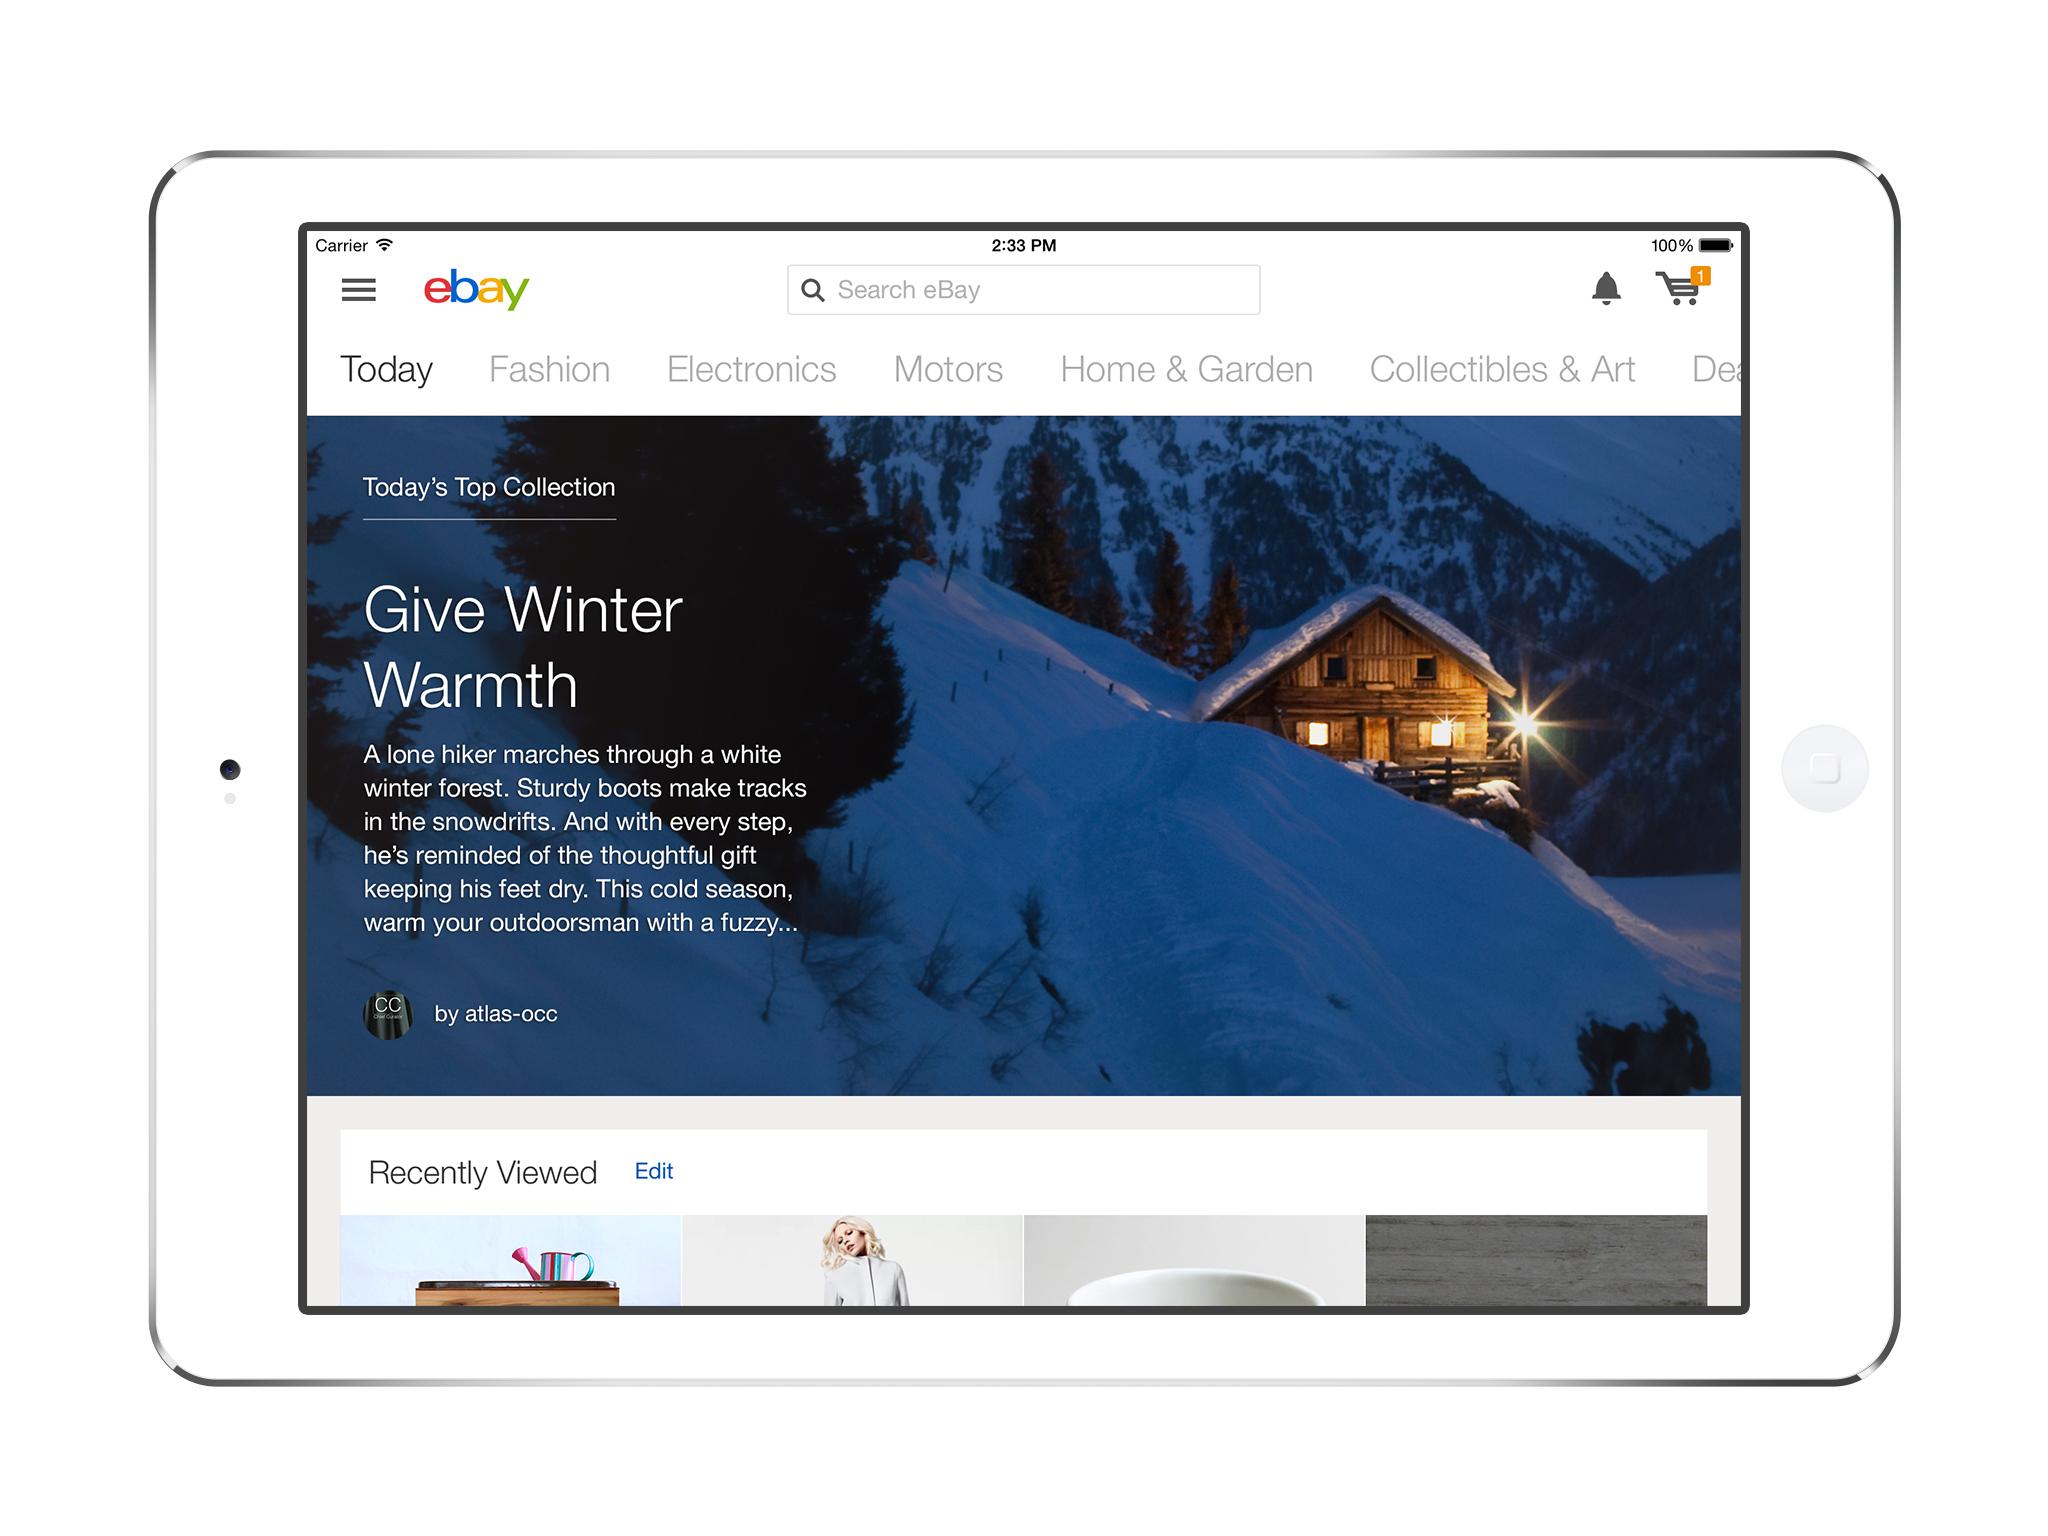 Ebay s new ipad app design hints at its e commerce future for Best home decor apps ipad